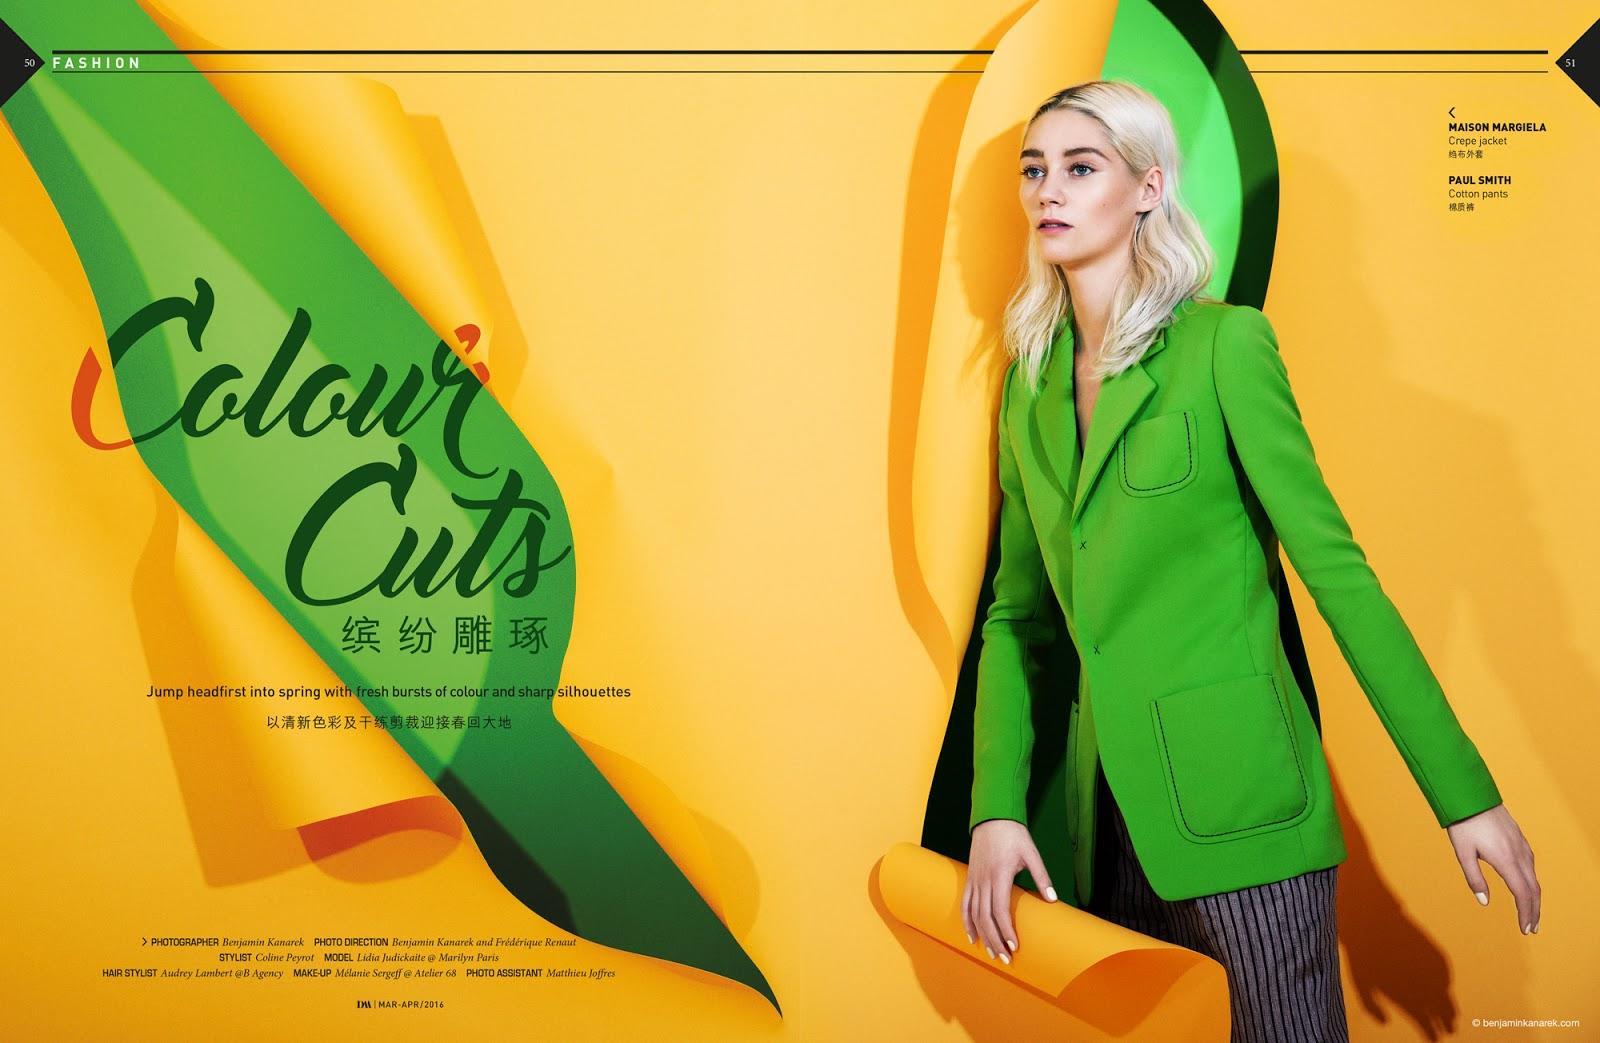 https://1.bp.blogspot.com/-cOT1XFcr8lg/Vuxn62wpExI/AAAAAAABvCo/JarLdfWrwq06nOJEo3B_B_lAqVKj0SaoA/s1600/Lidia-Judickaite-in-Colour-Cuts-by-Benjamin-Kanarek-for-DM-01.jpg